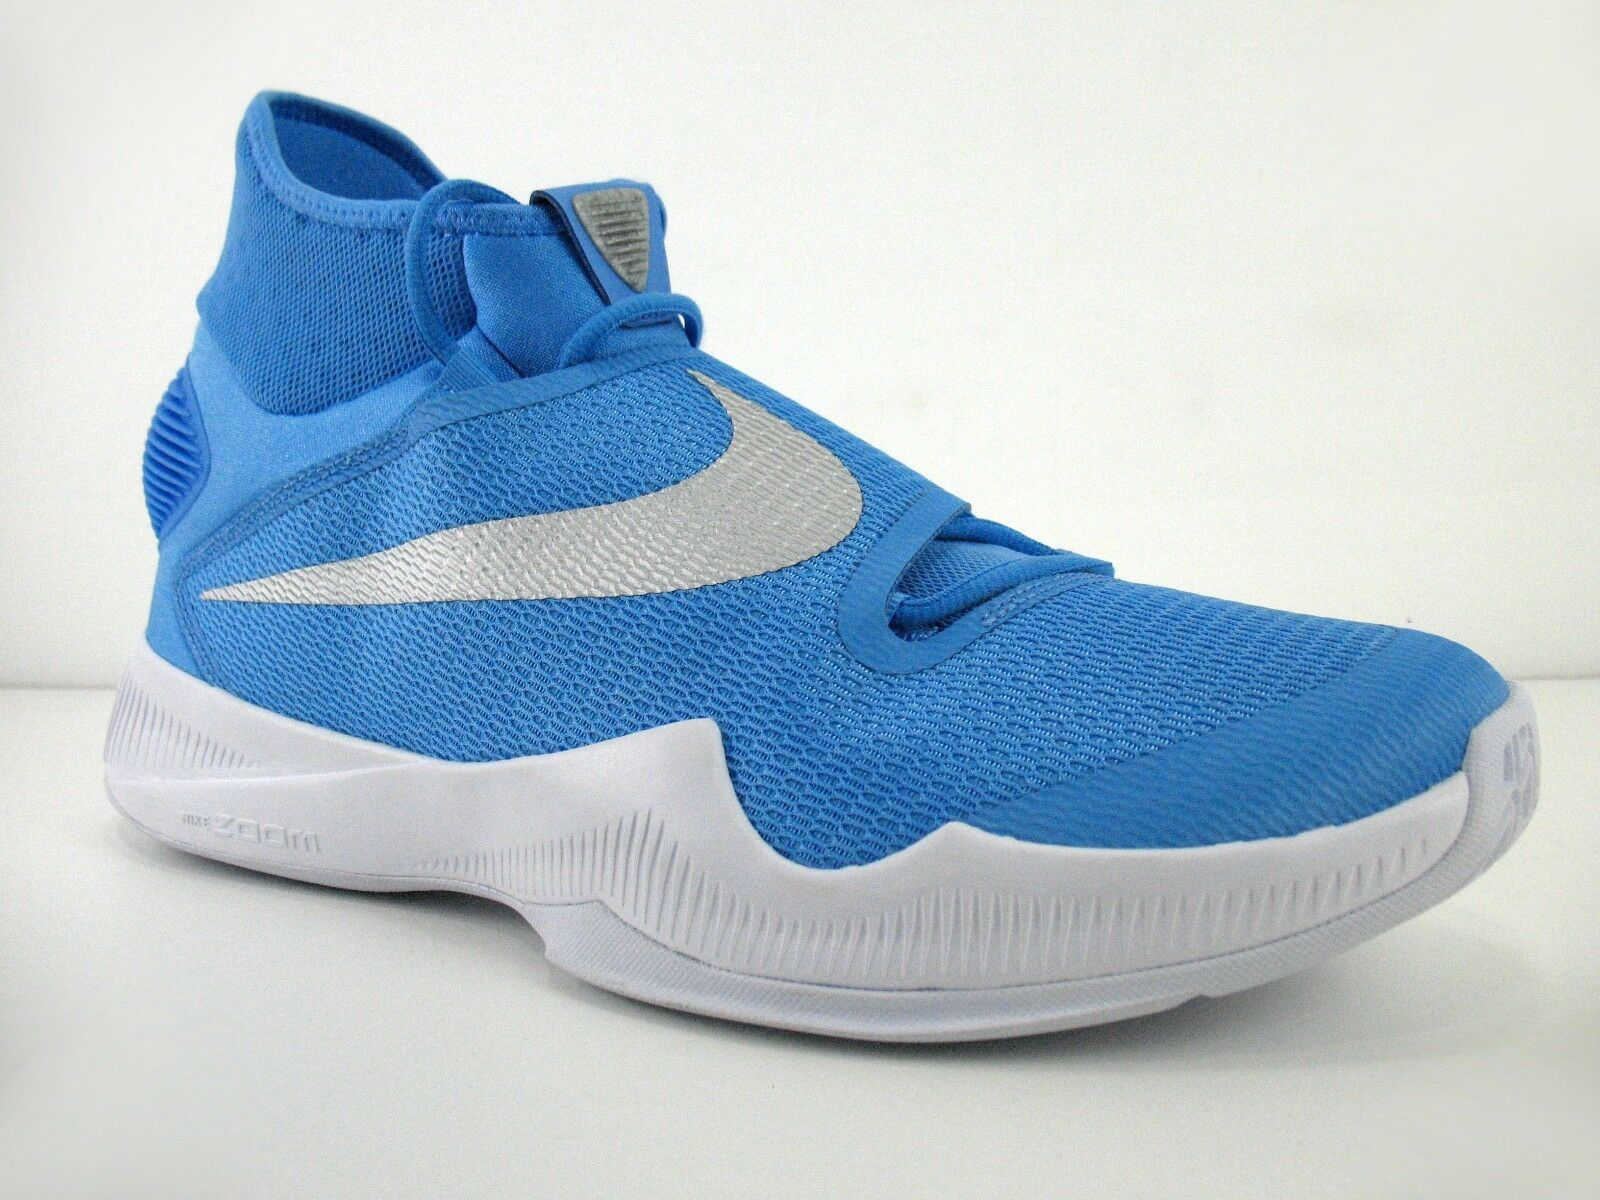 Nike zoom hyperrev 2018 tb - basketball - schuhe - 835439-403 - größe 15,5 - neue